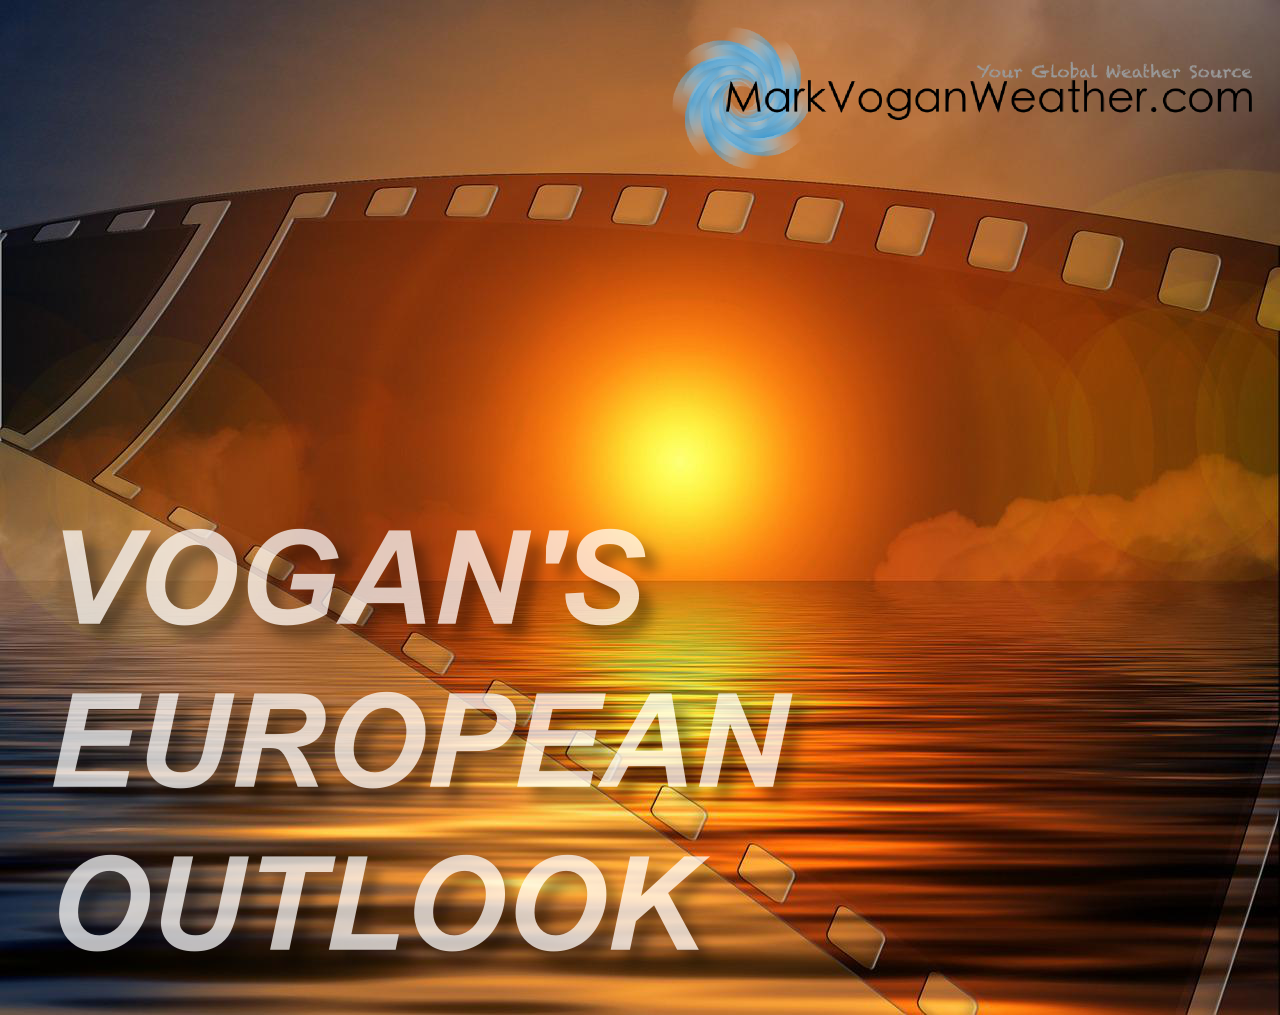 THU 3 JUL: VOGAN'S EUROPEAN OUTLOOK